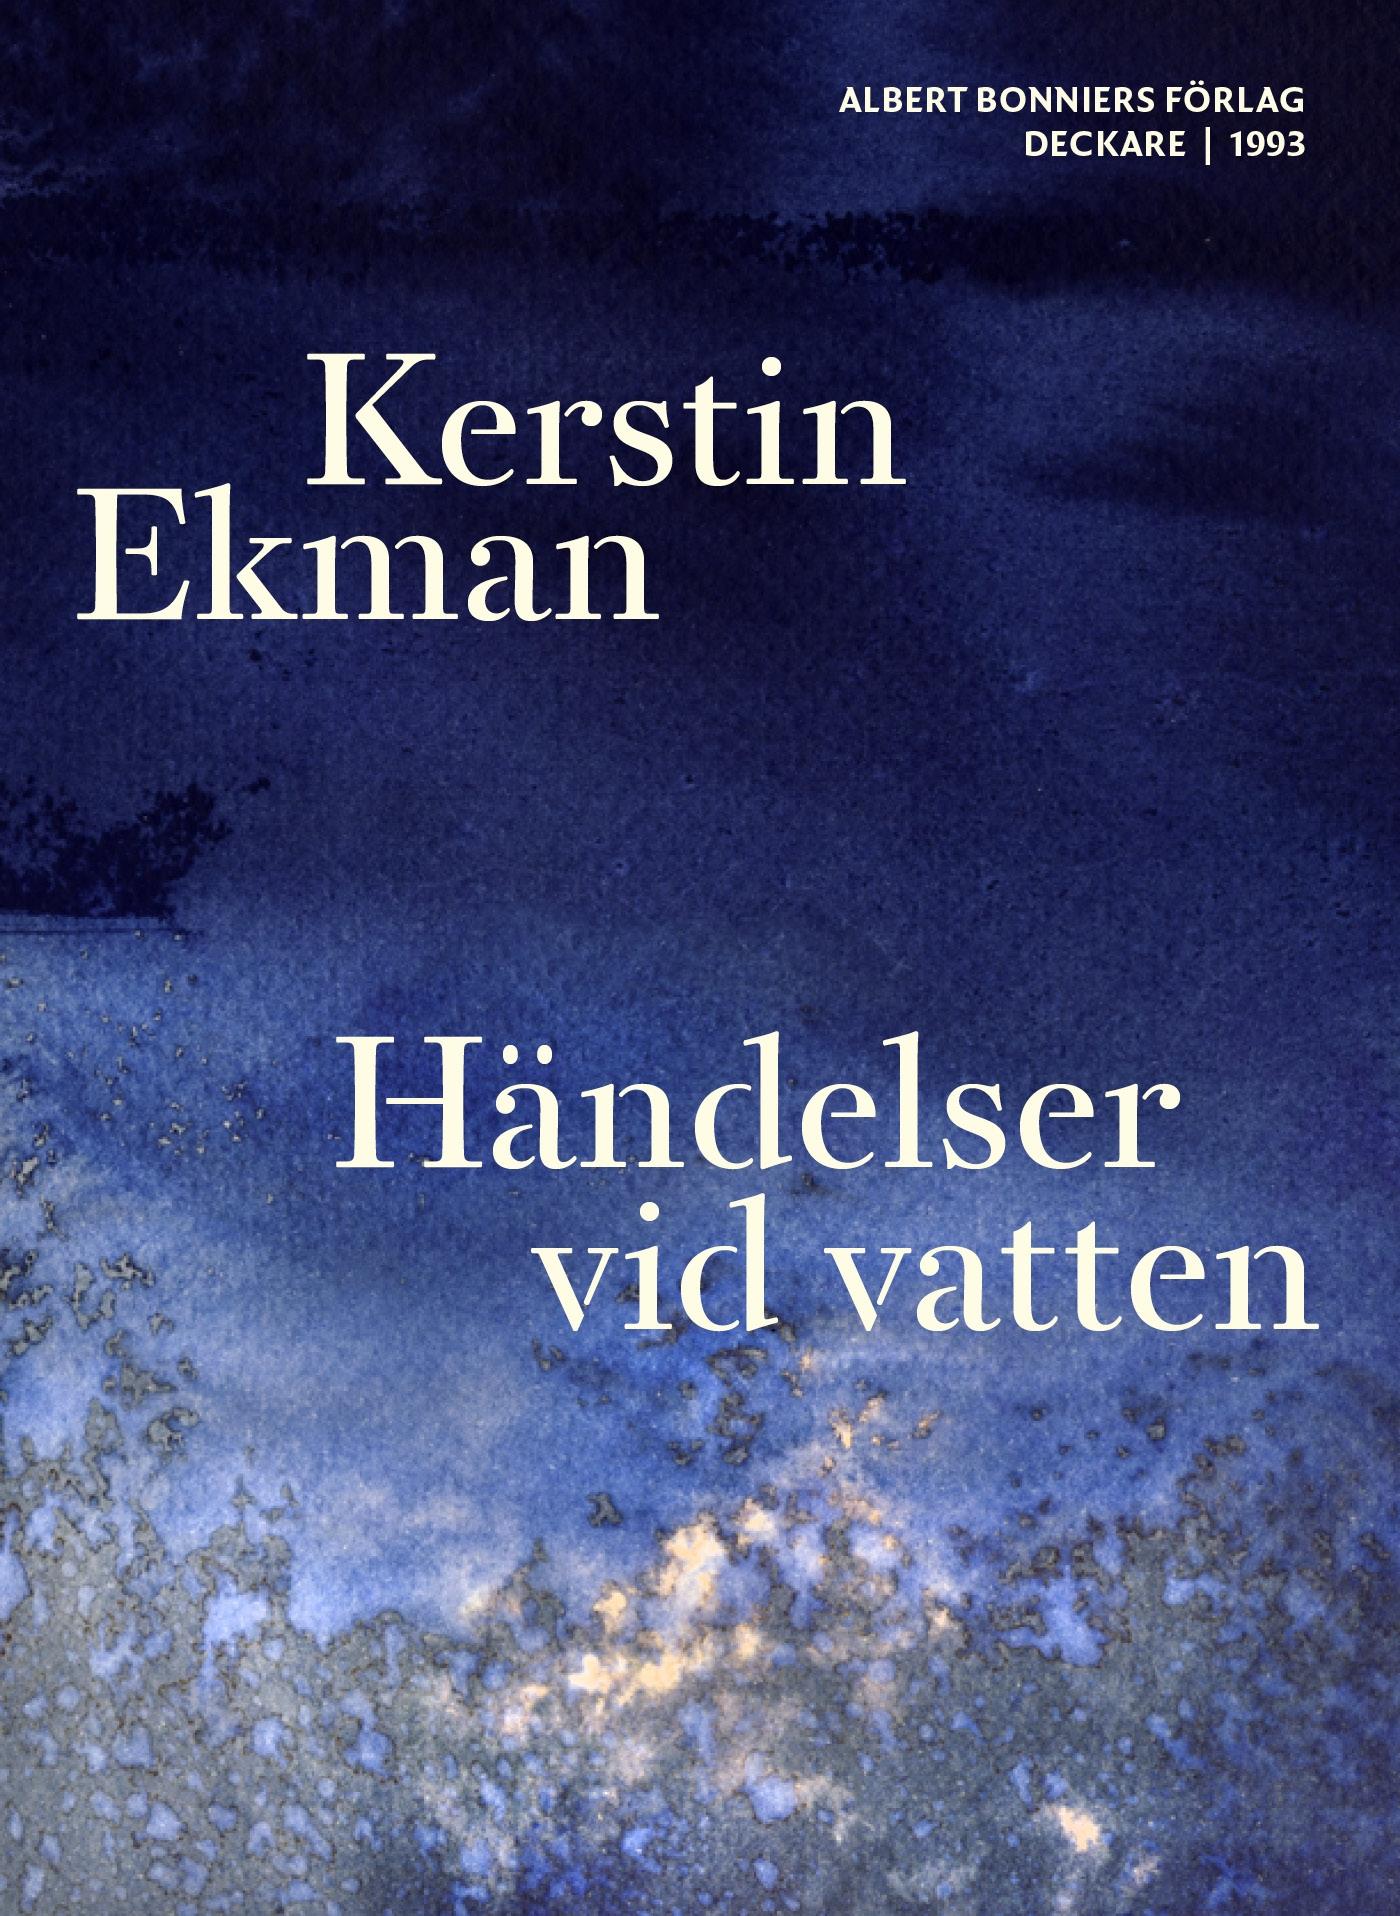 Kerstin ekman händelser vid vatten film